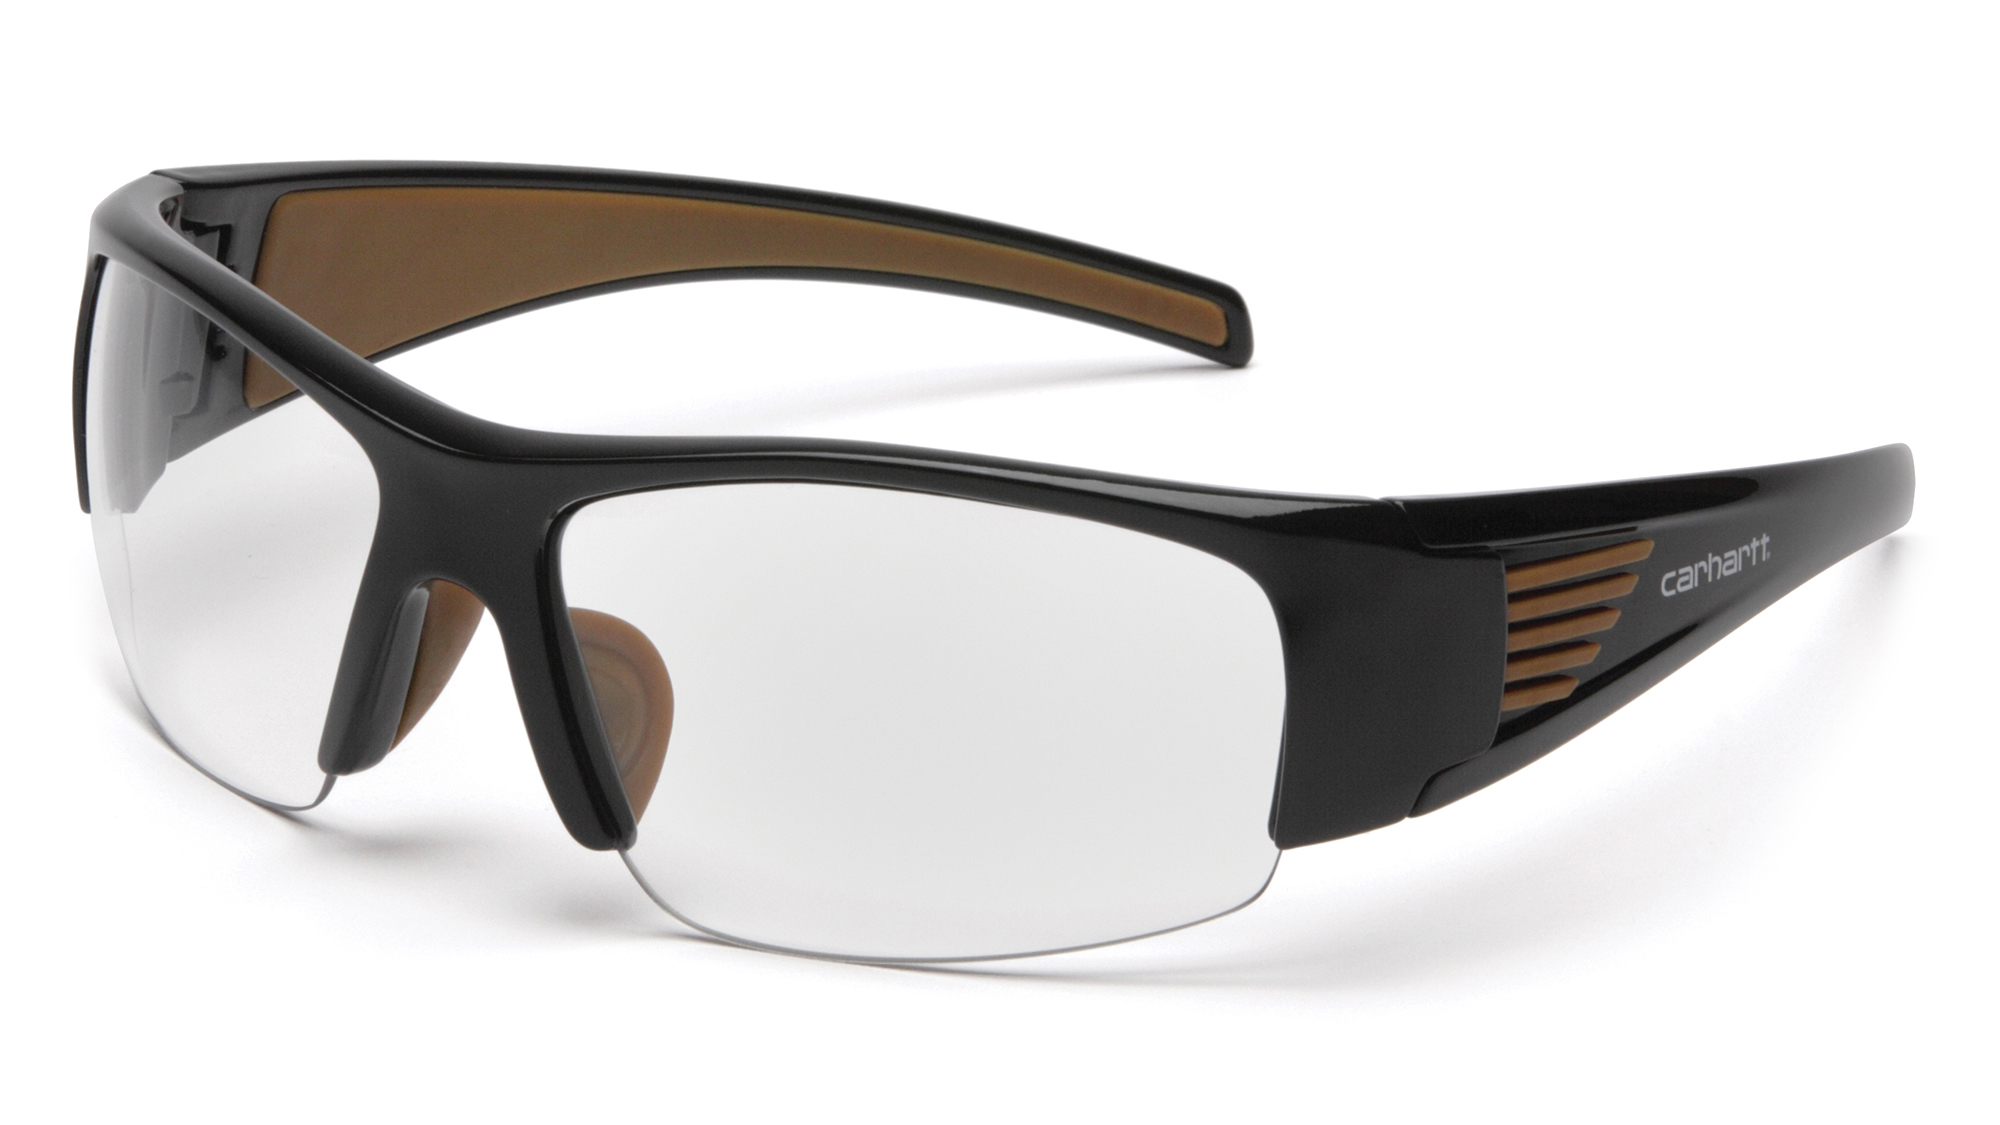 Carhartt Thunder Bay Clear Anti-Fog Lens Safety Glasses -